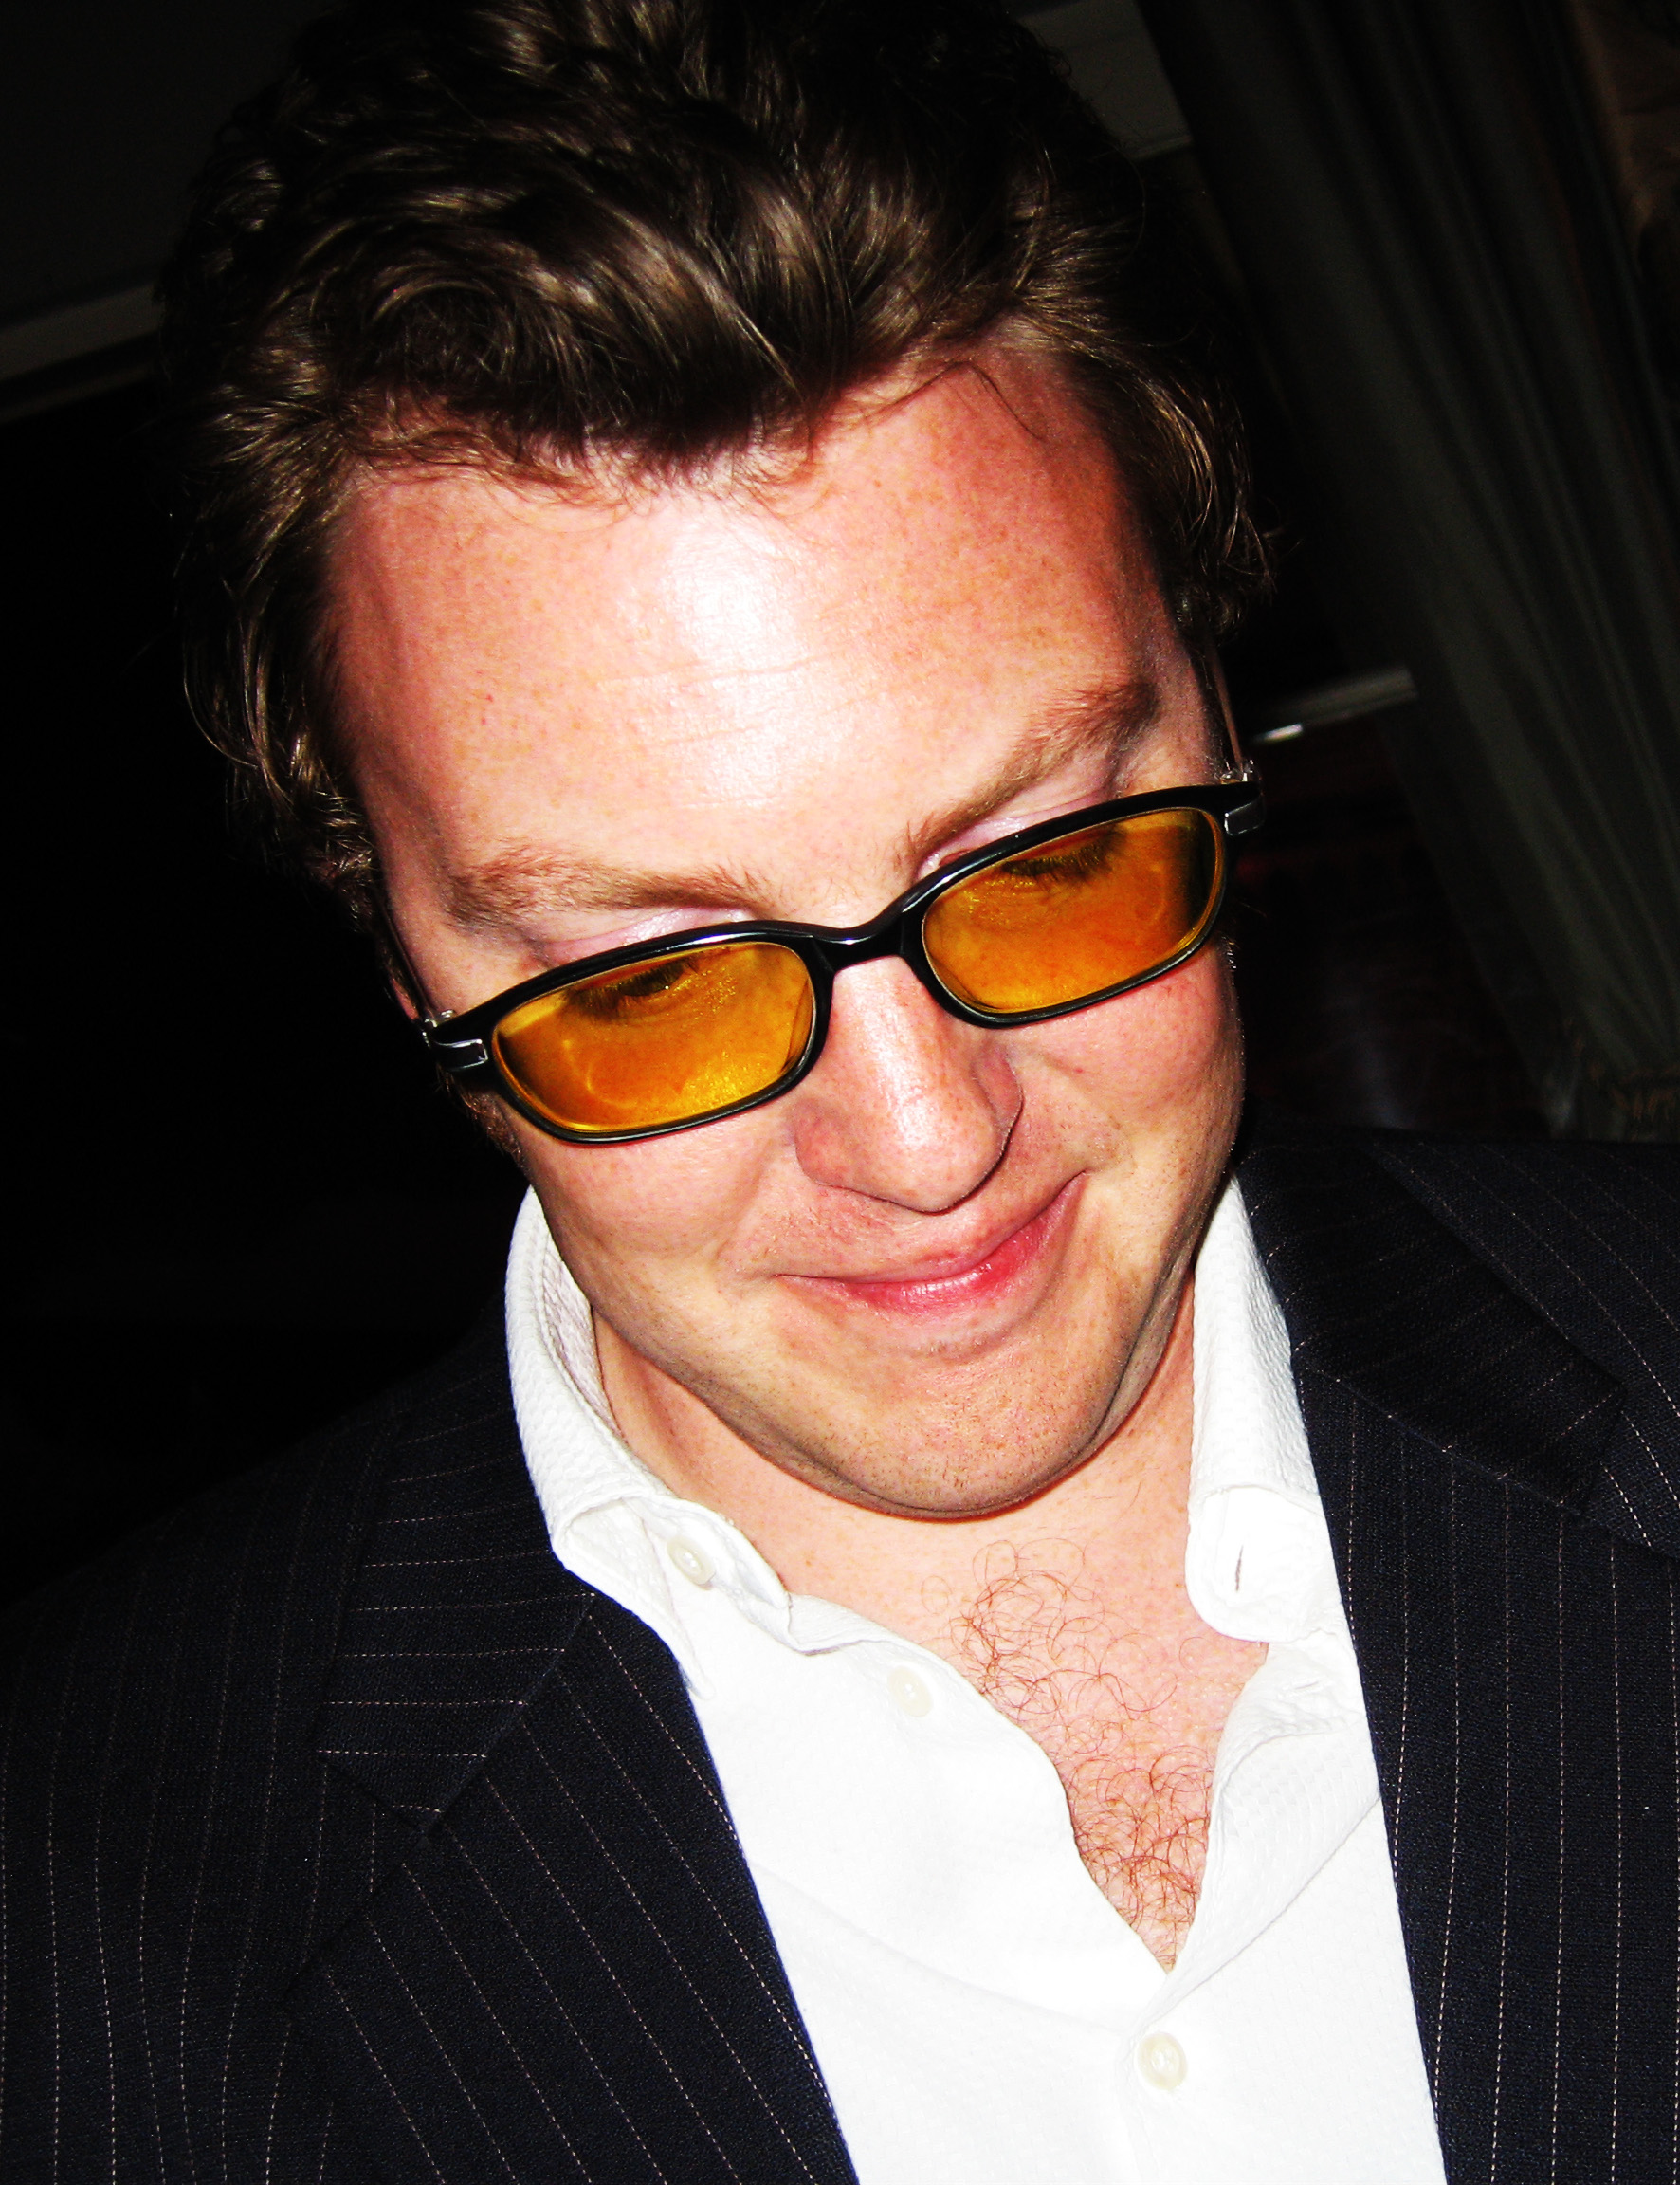 Matt Shearer at The BAFTAS - 2006